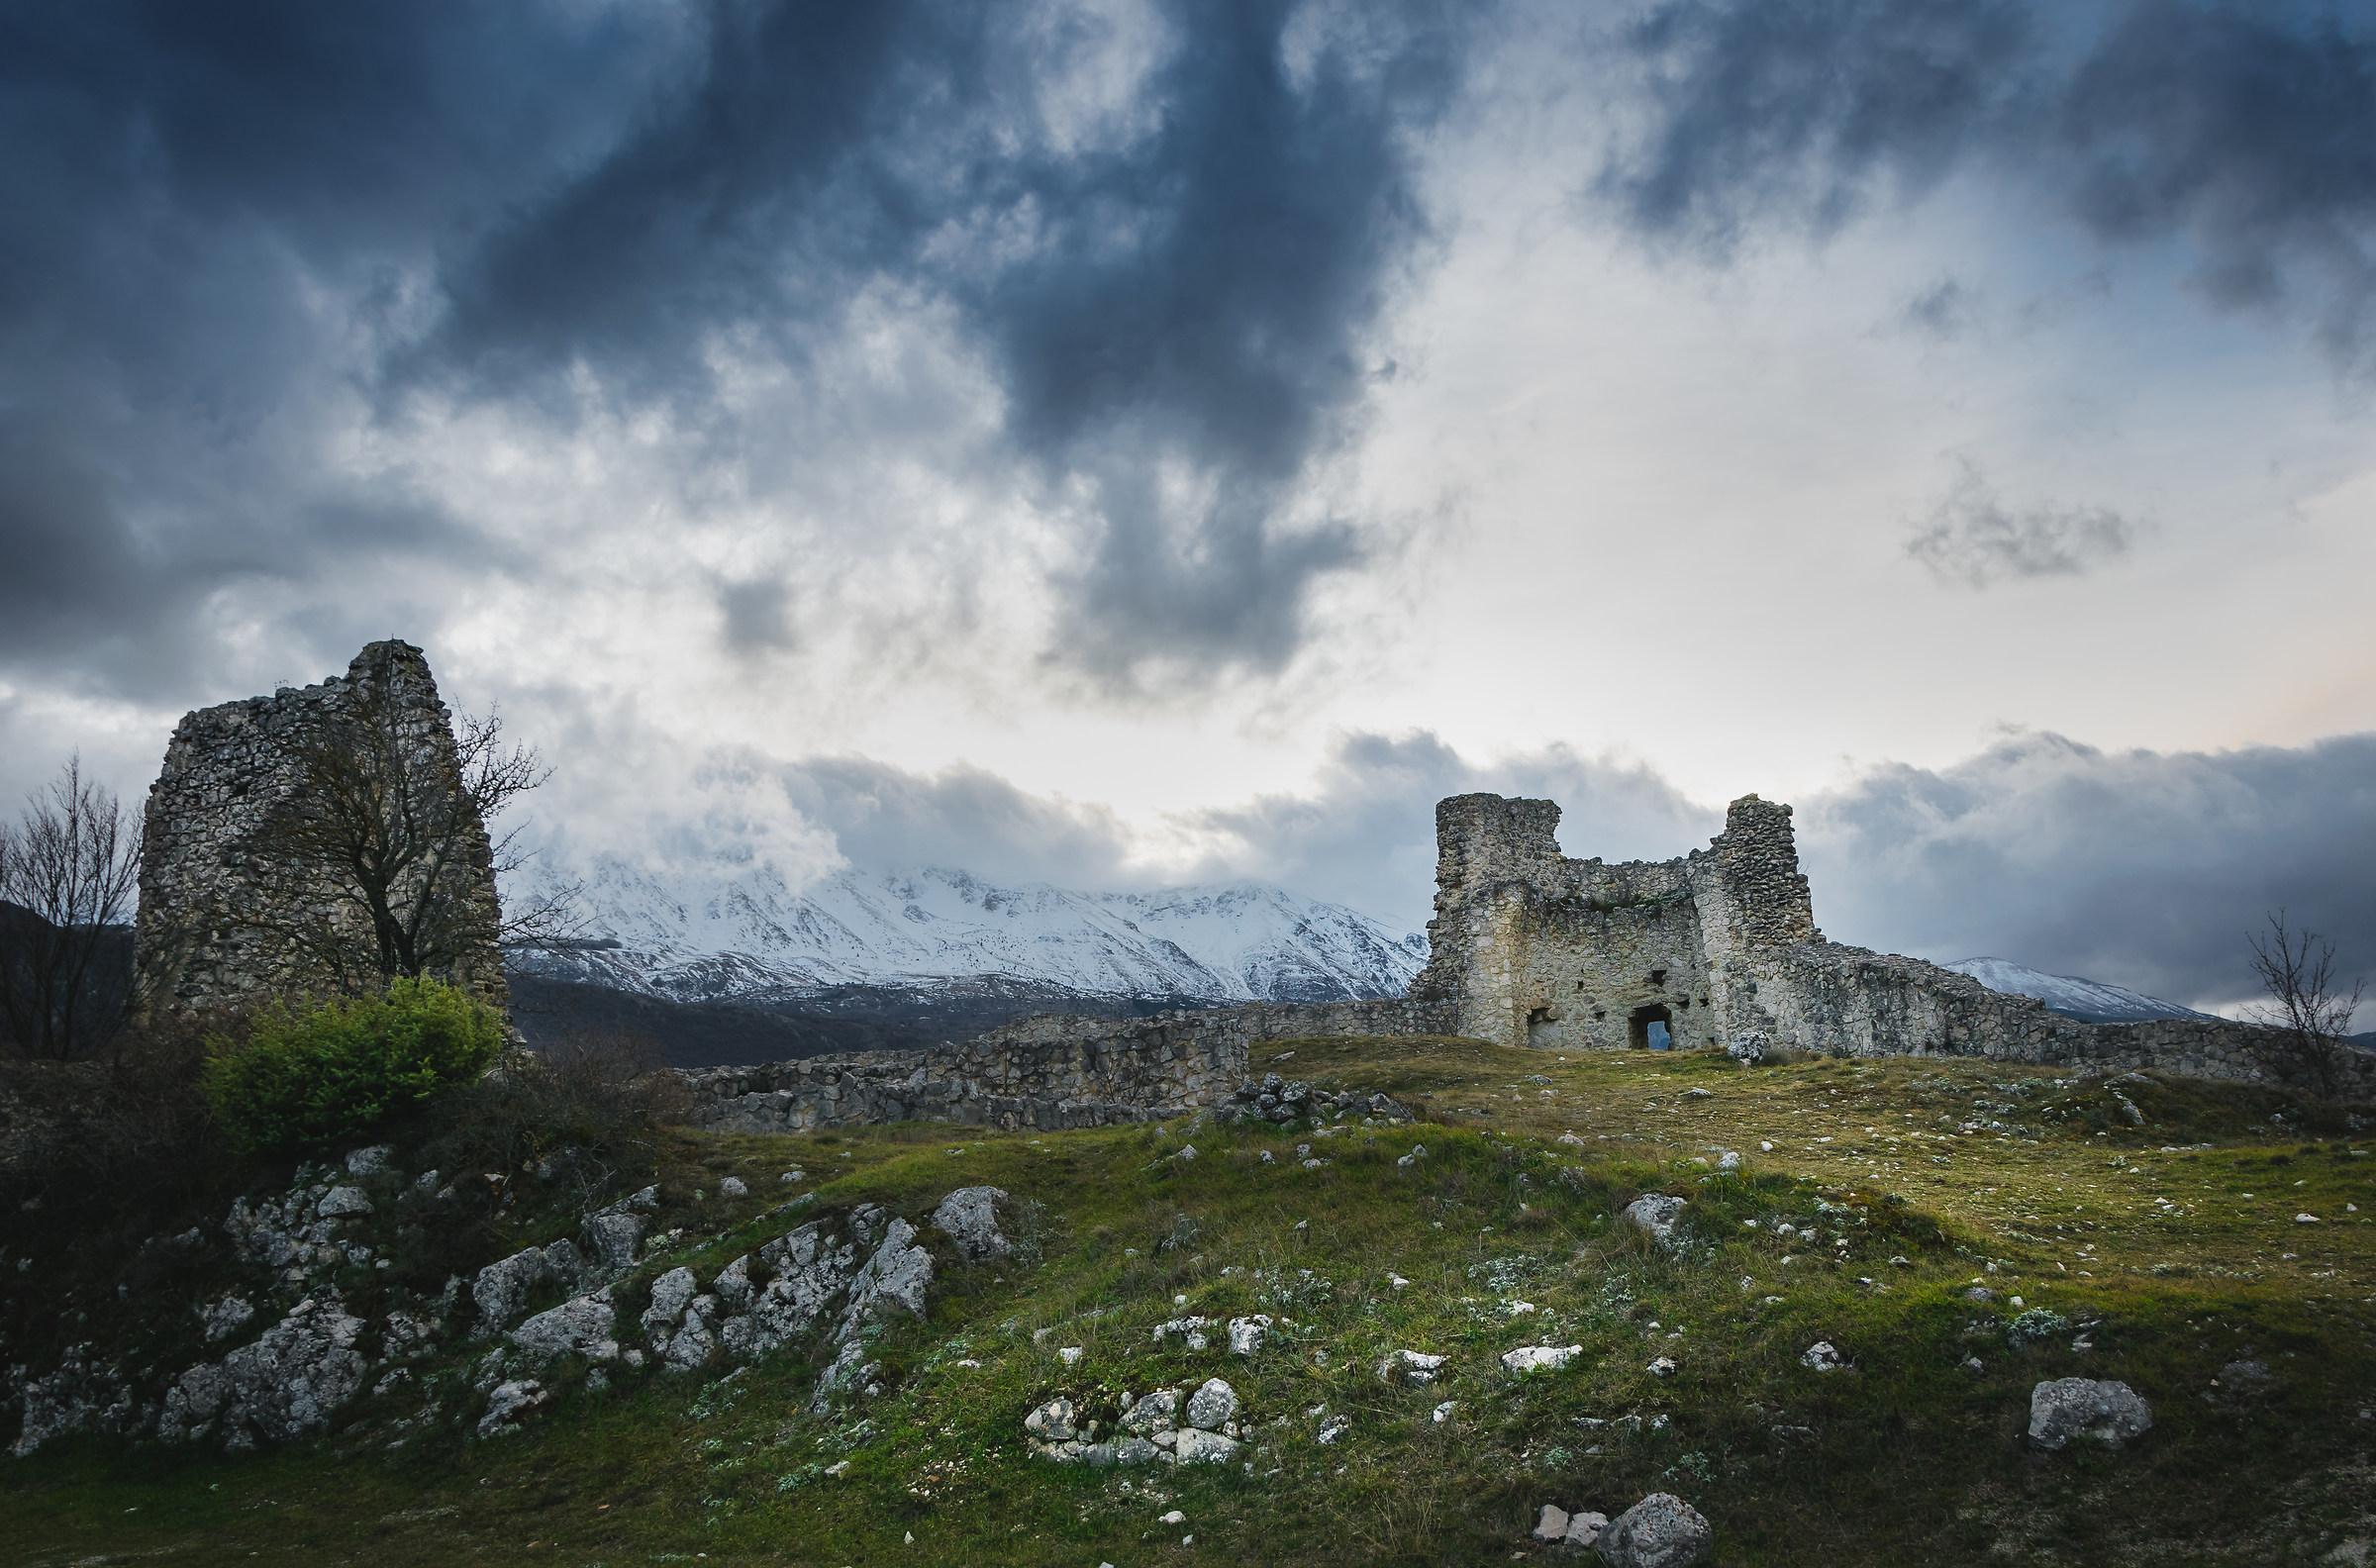 Rocca di sant'eusanio forconese, gennaio 2018...